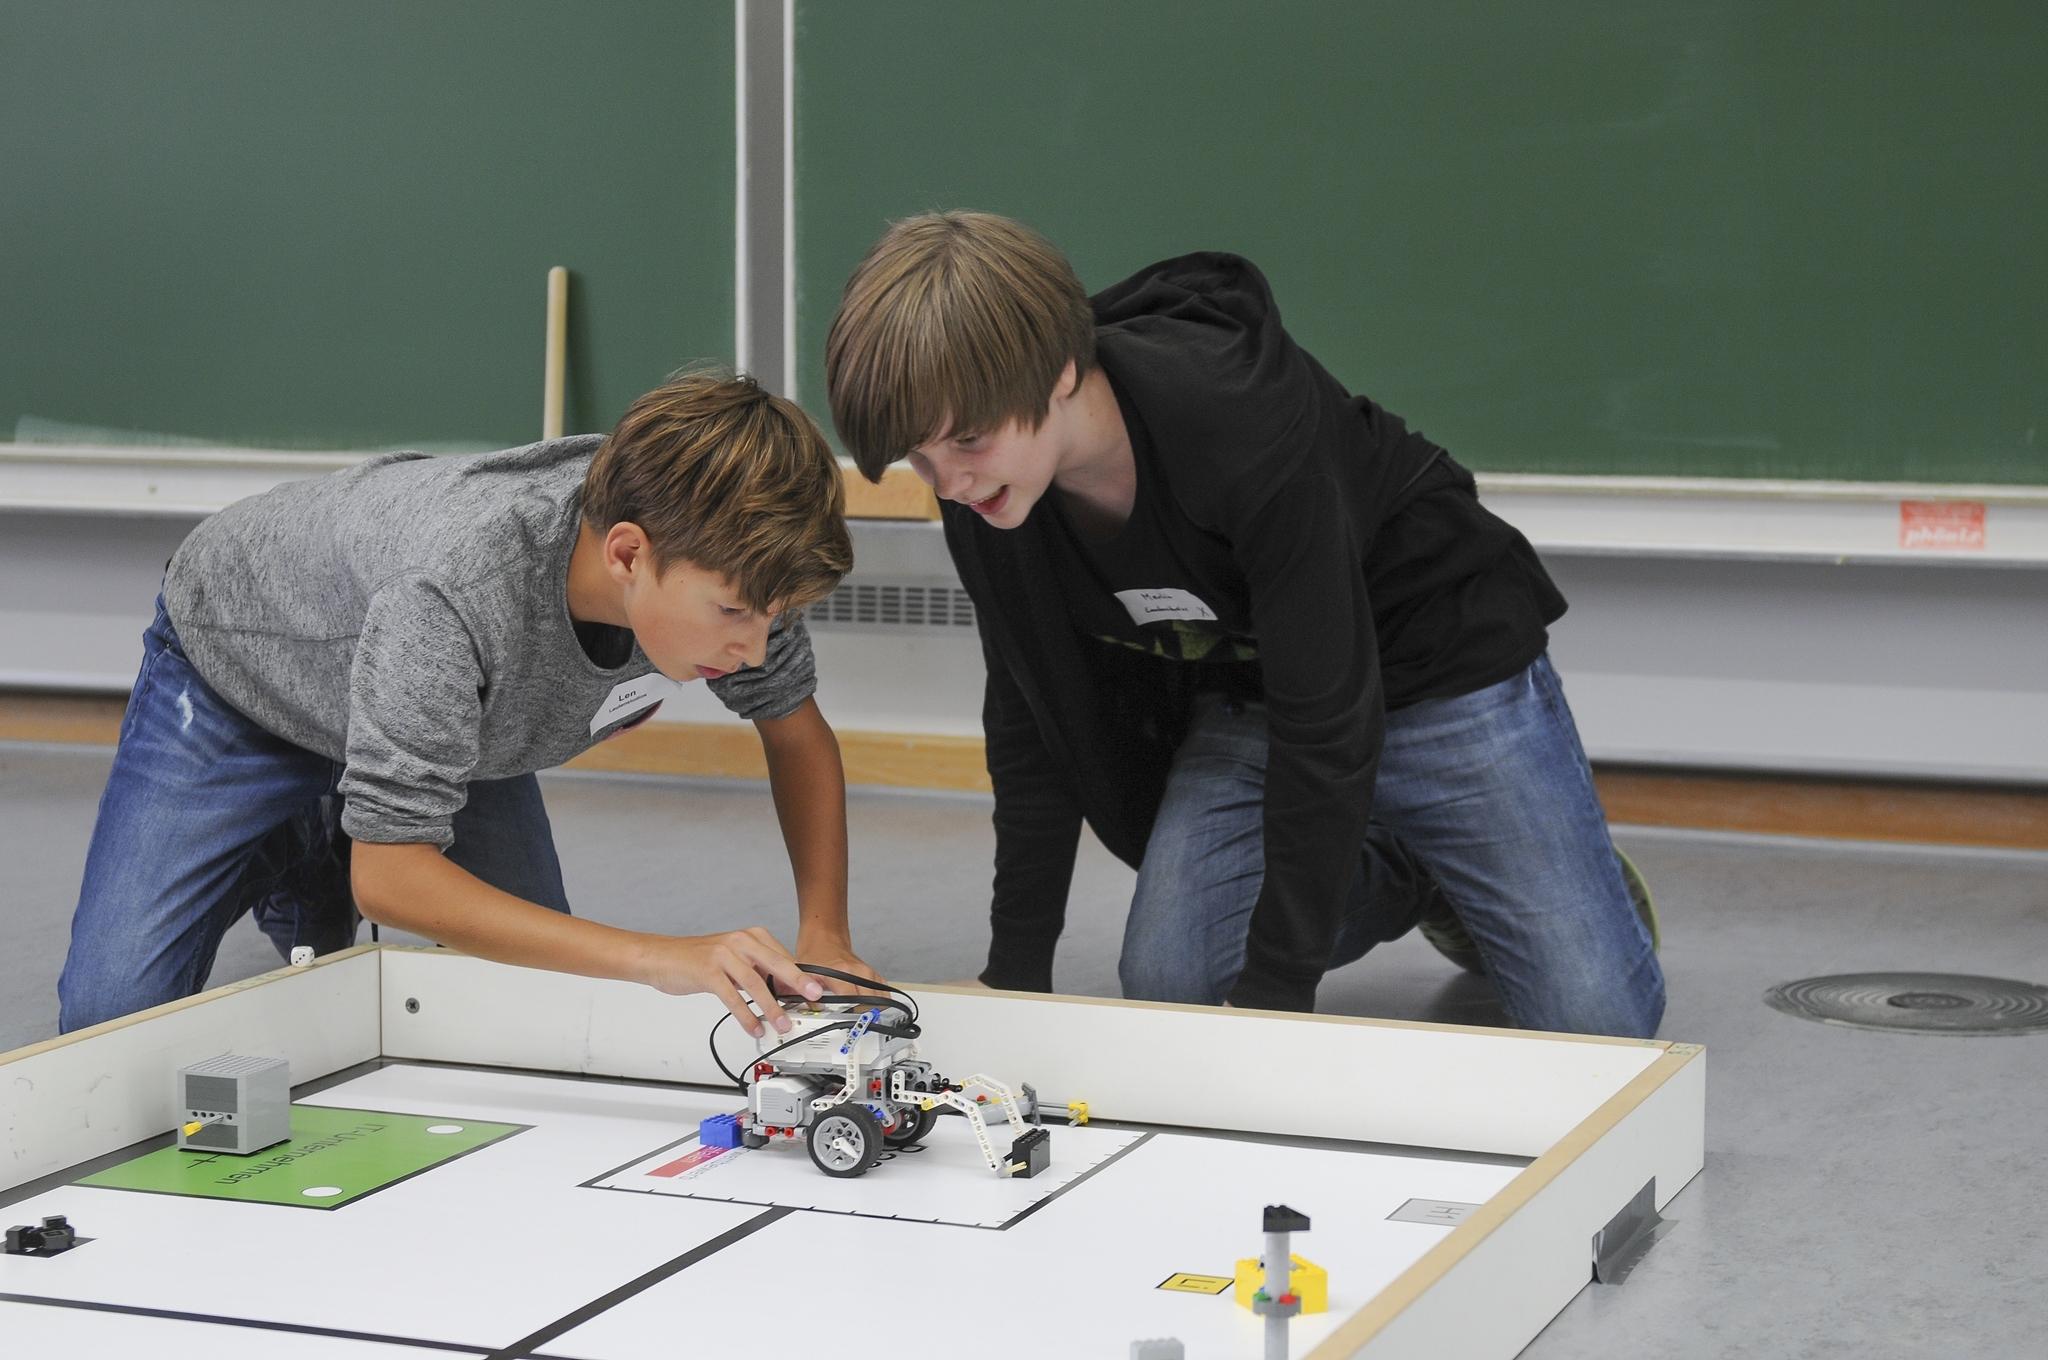 zdi-Roboterwettbewerb 2018 – Lokalwettbewerb Wuppertal